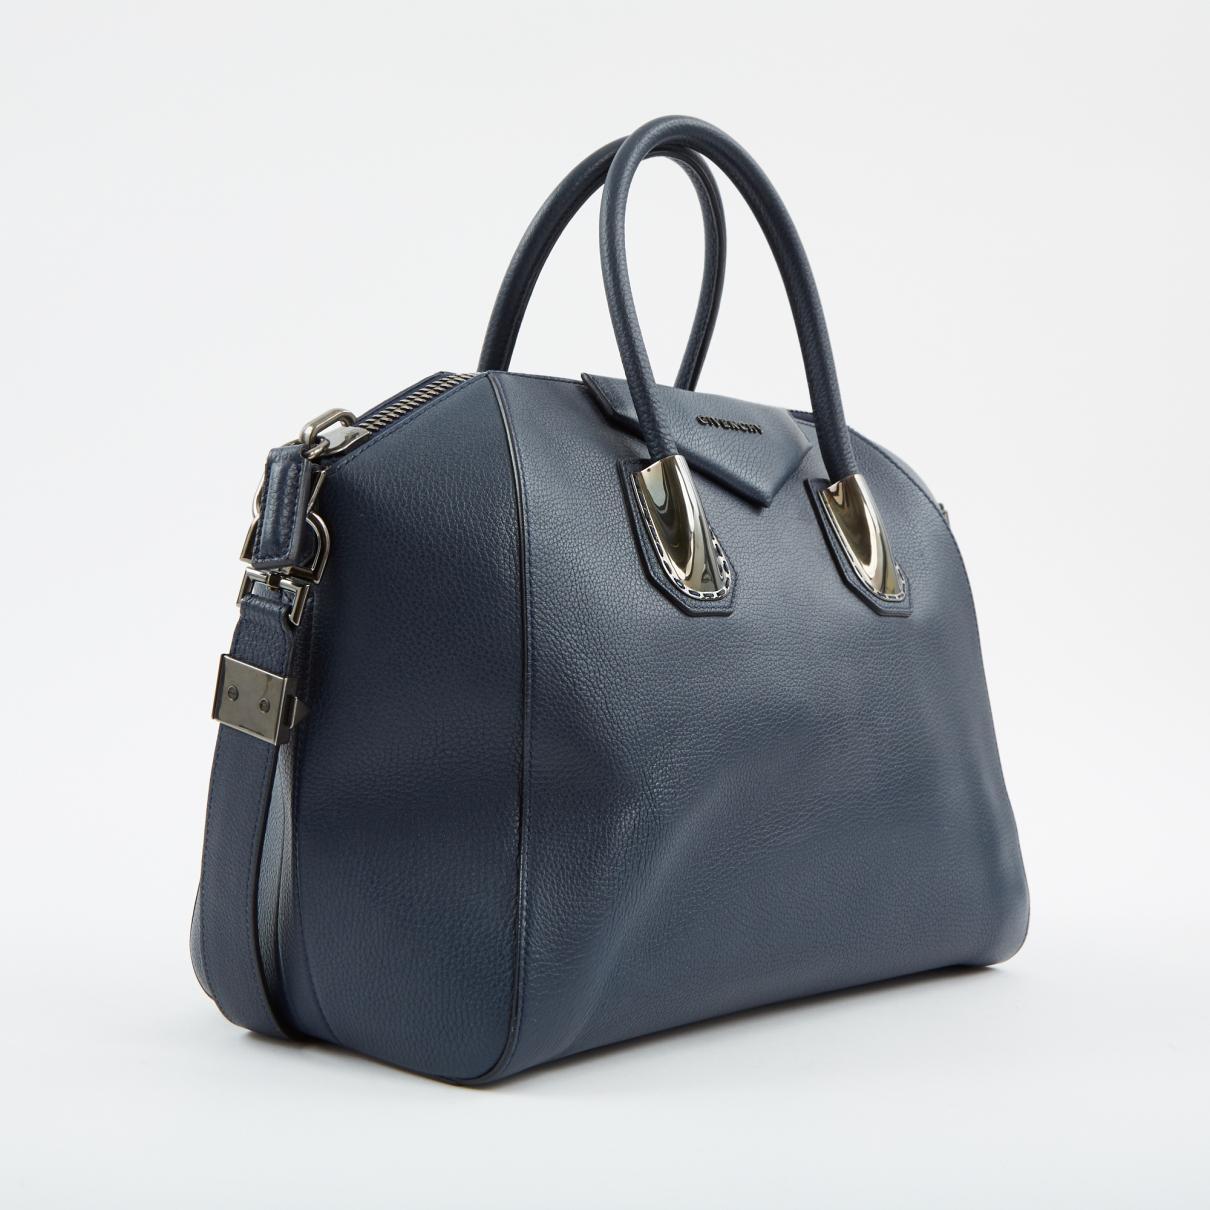 21f633aaf169 Givenchy antigona leather handbag in blue lyst jpg 1210x1210 Givenchy navy  antigona